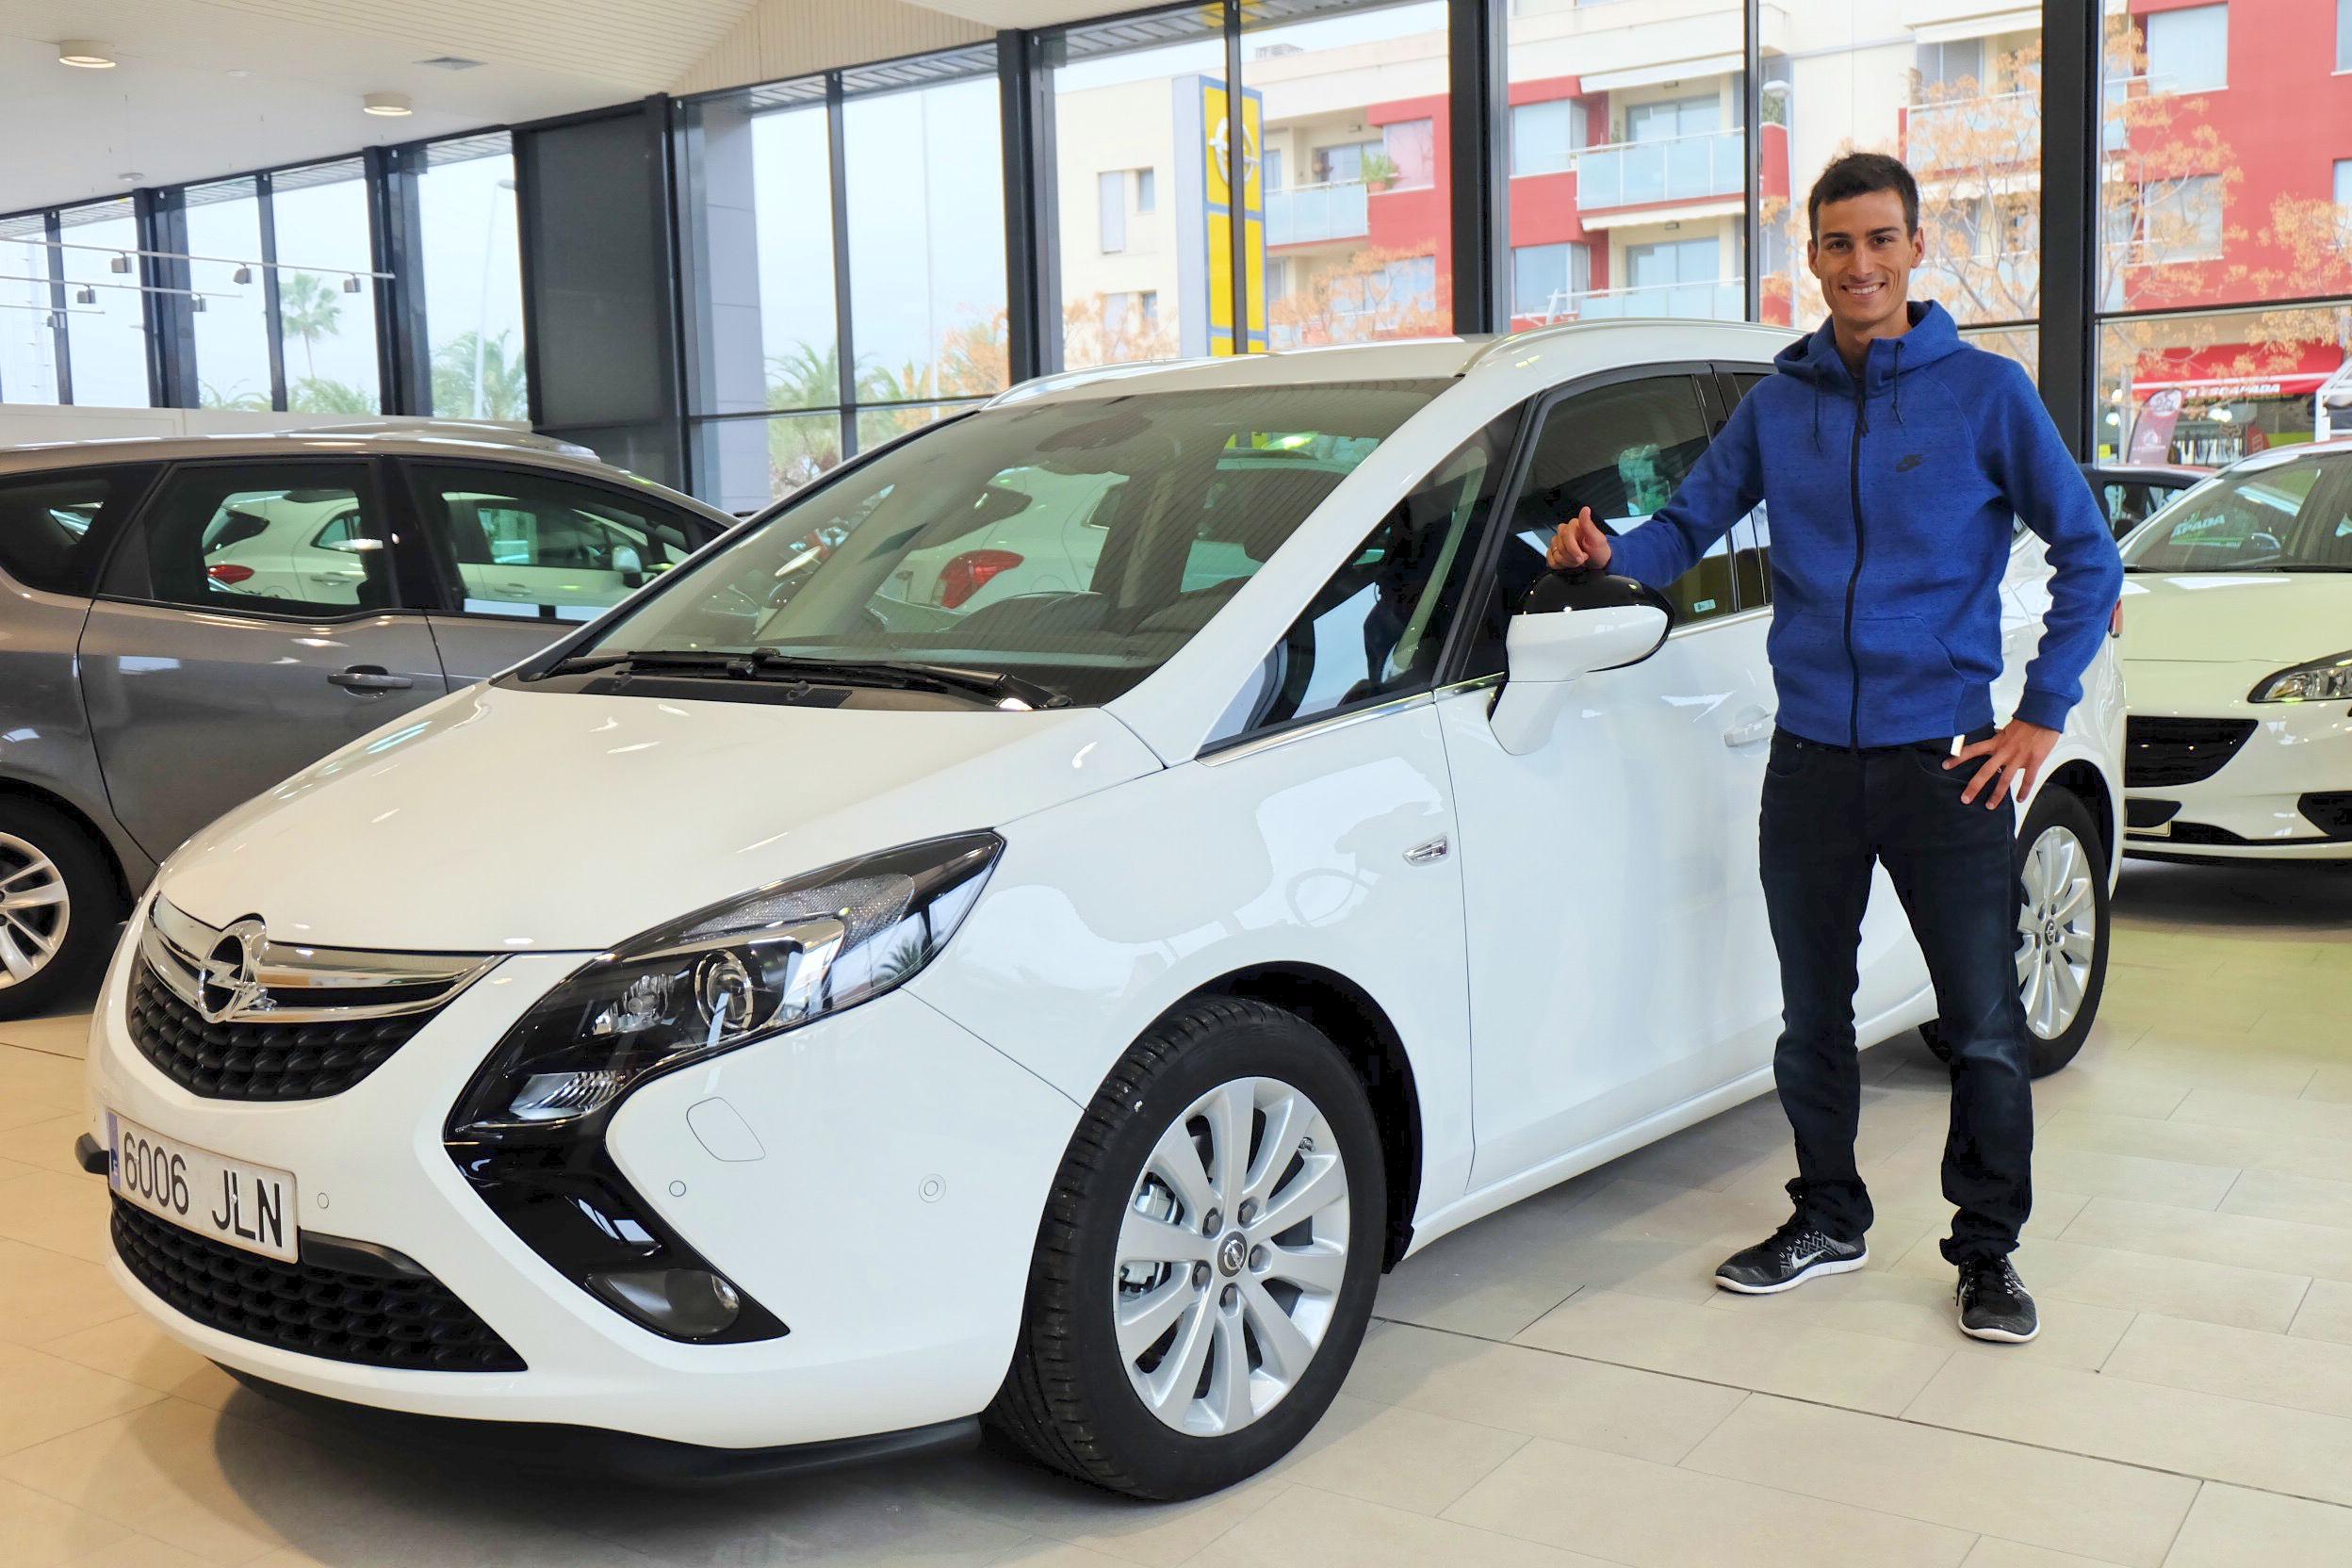 Mario Mola Díaz empieza a disfrutar de su Opel Zafira Tourer en Inca Centro Auto